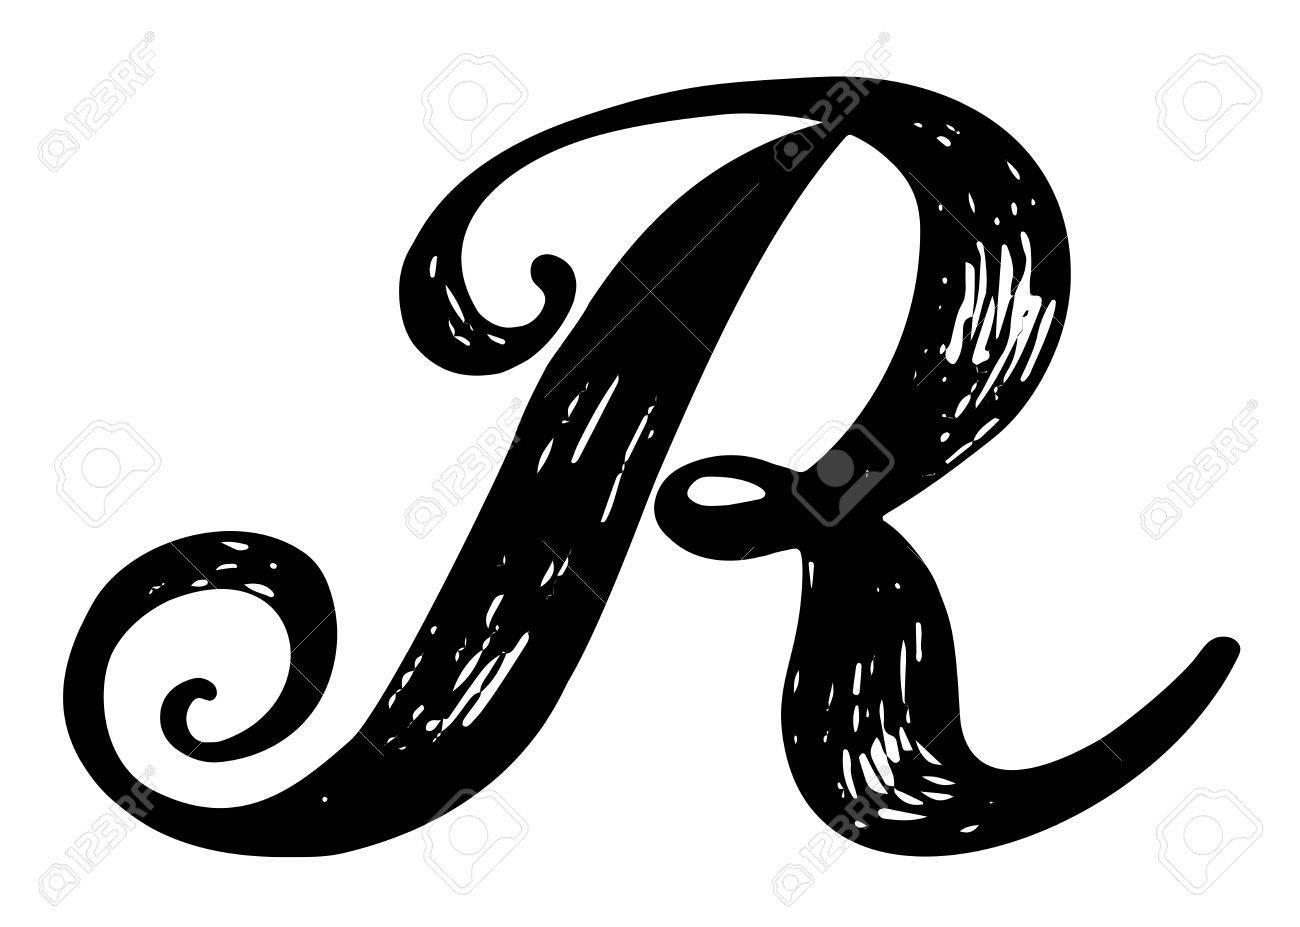 Letter R. Calligraphy Alphabet Typeset Lettering. Hand Drawn